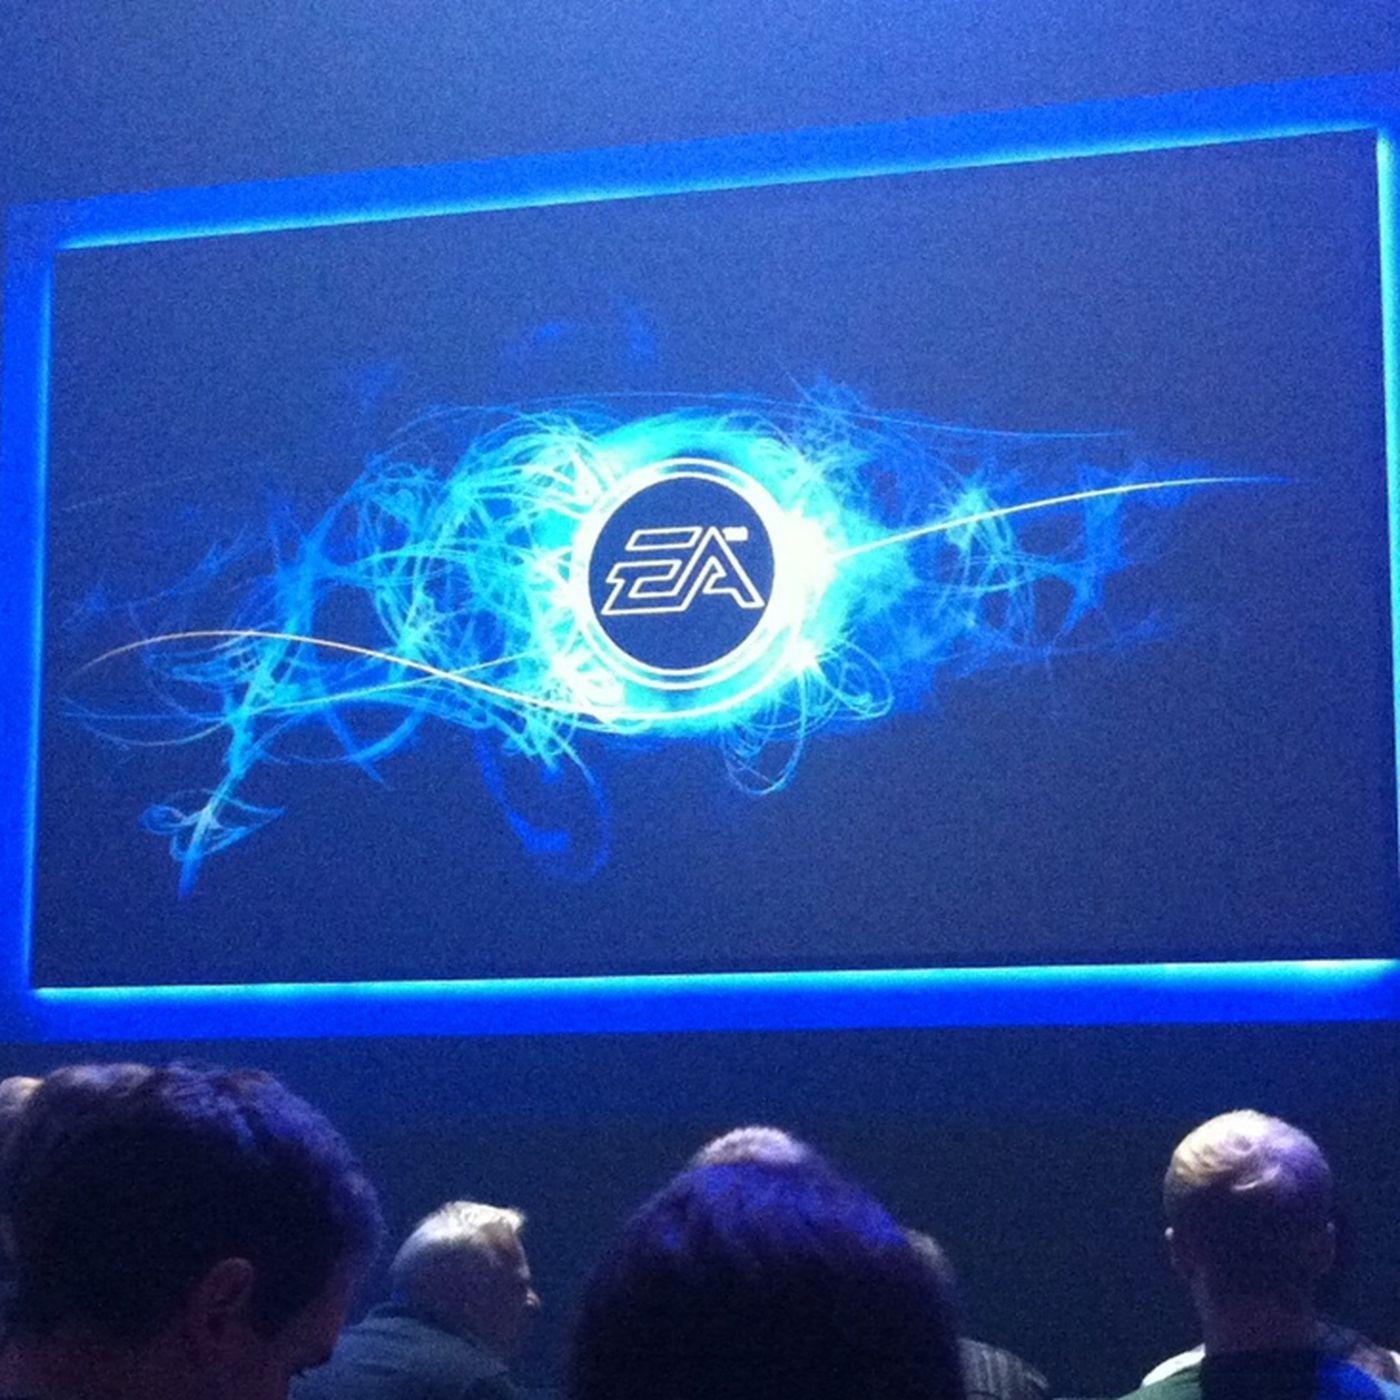 Electronic Arts at Gamescom 2012: Origin for Mac, 'Battlefield 3